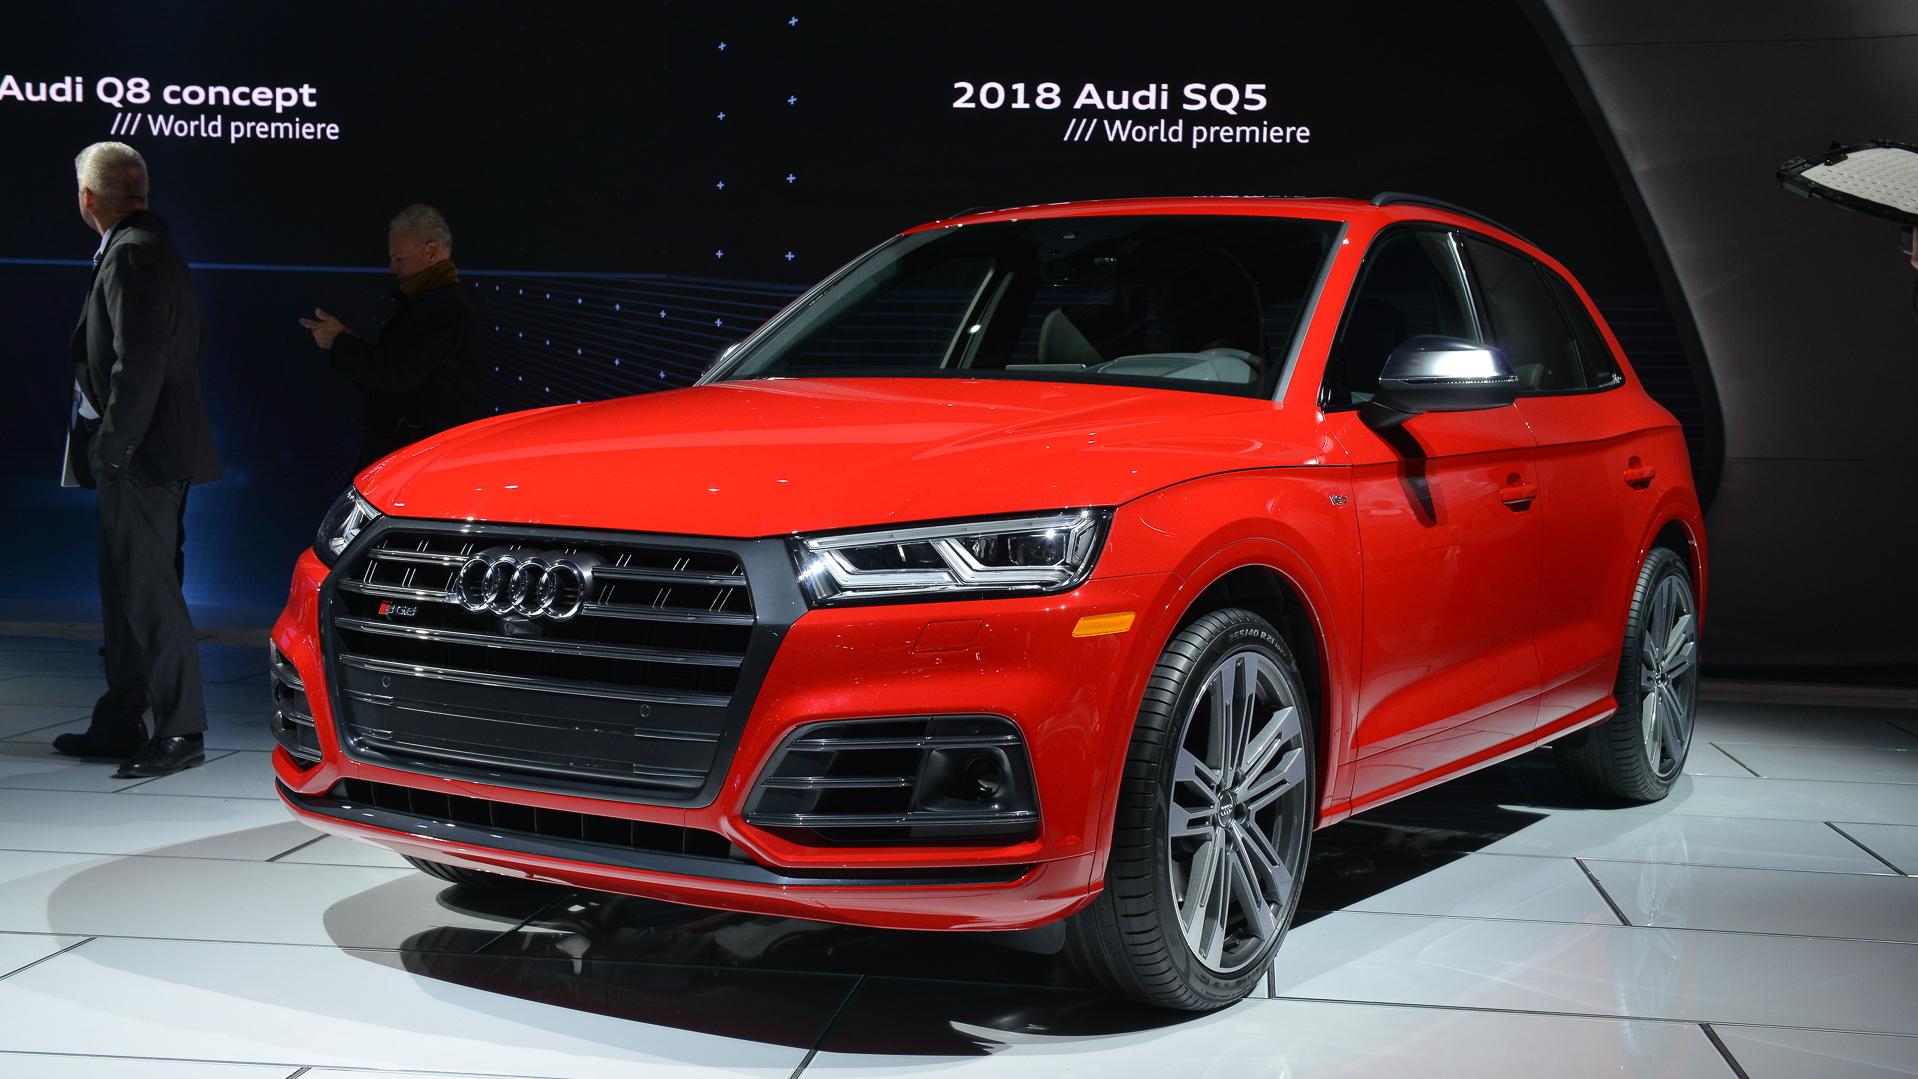 2018 Audi SQ5, 2017 Detroit auto show